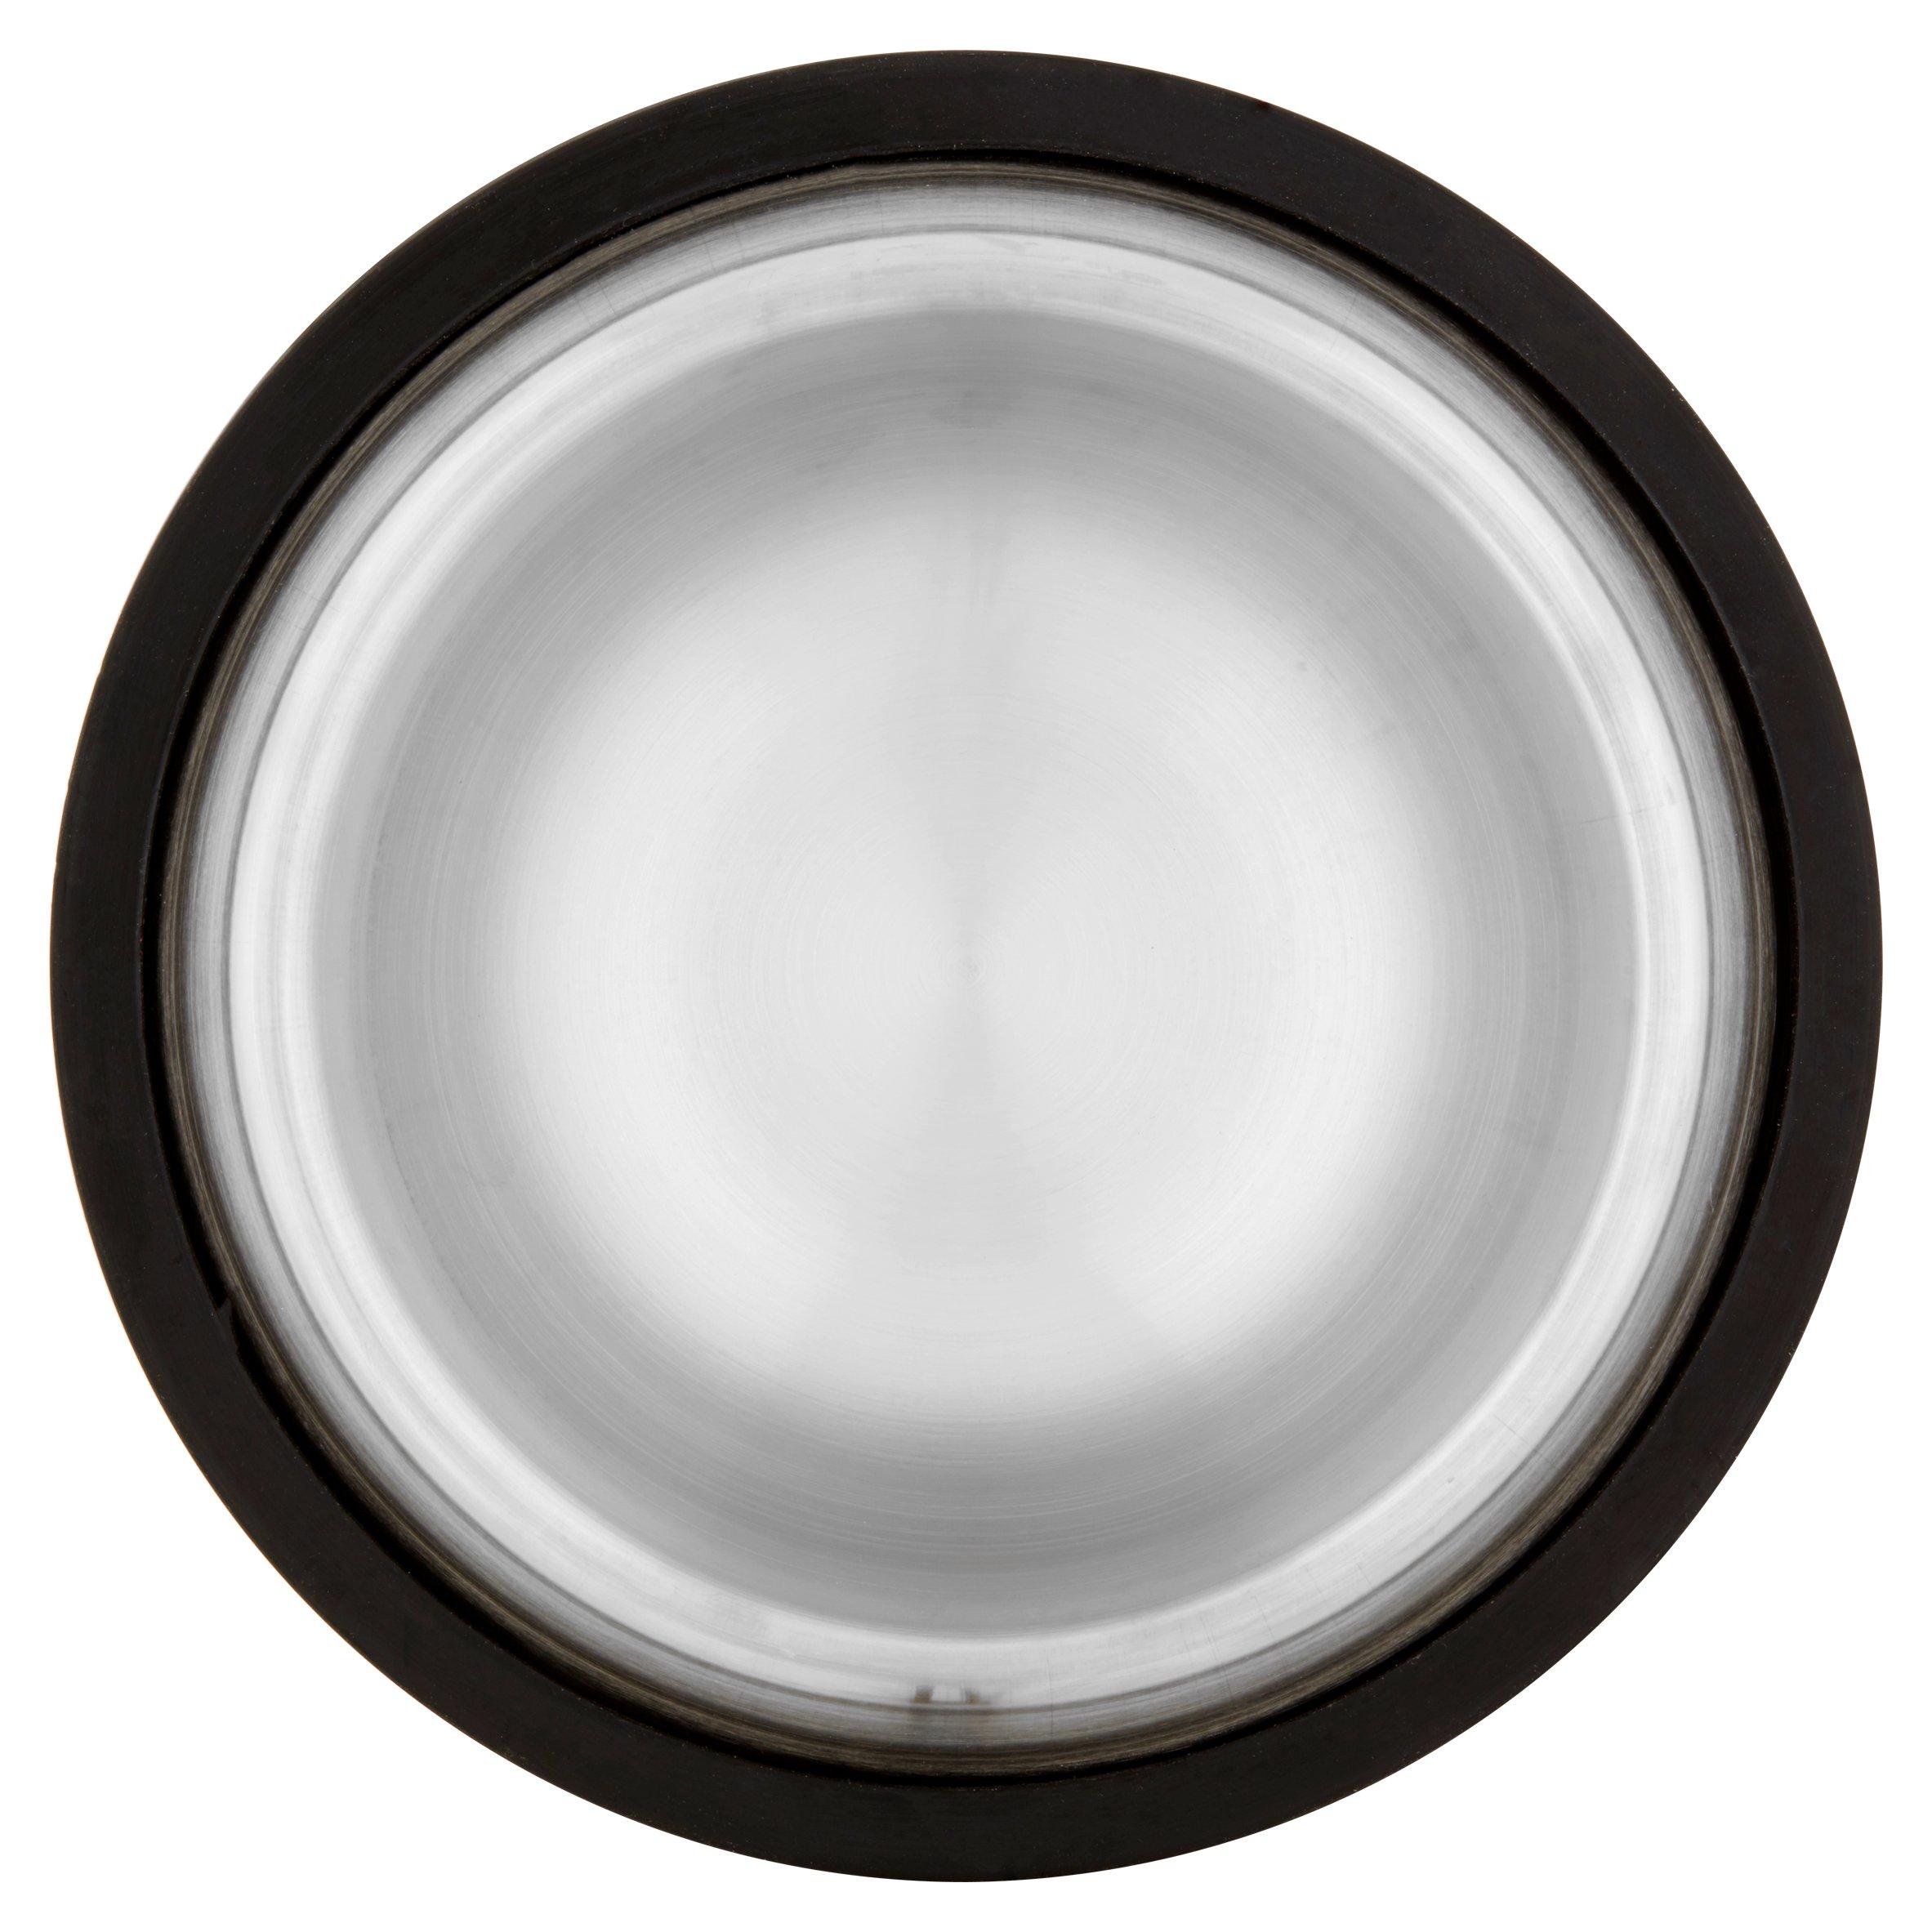 Gofetch Small Stainless Jumbo 33.81 fl oz Dog Bowl